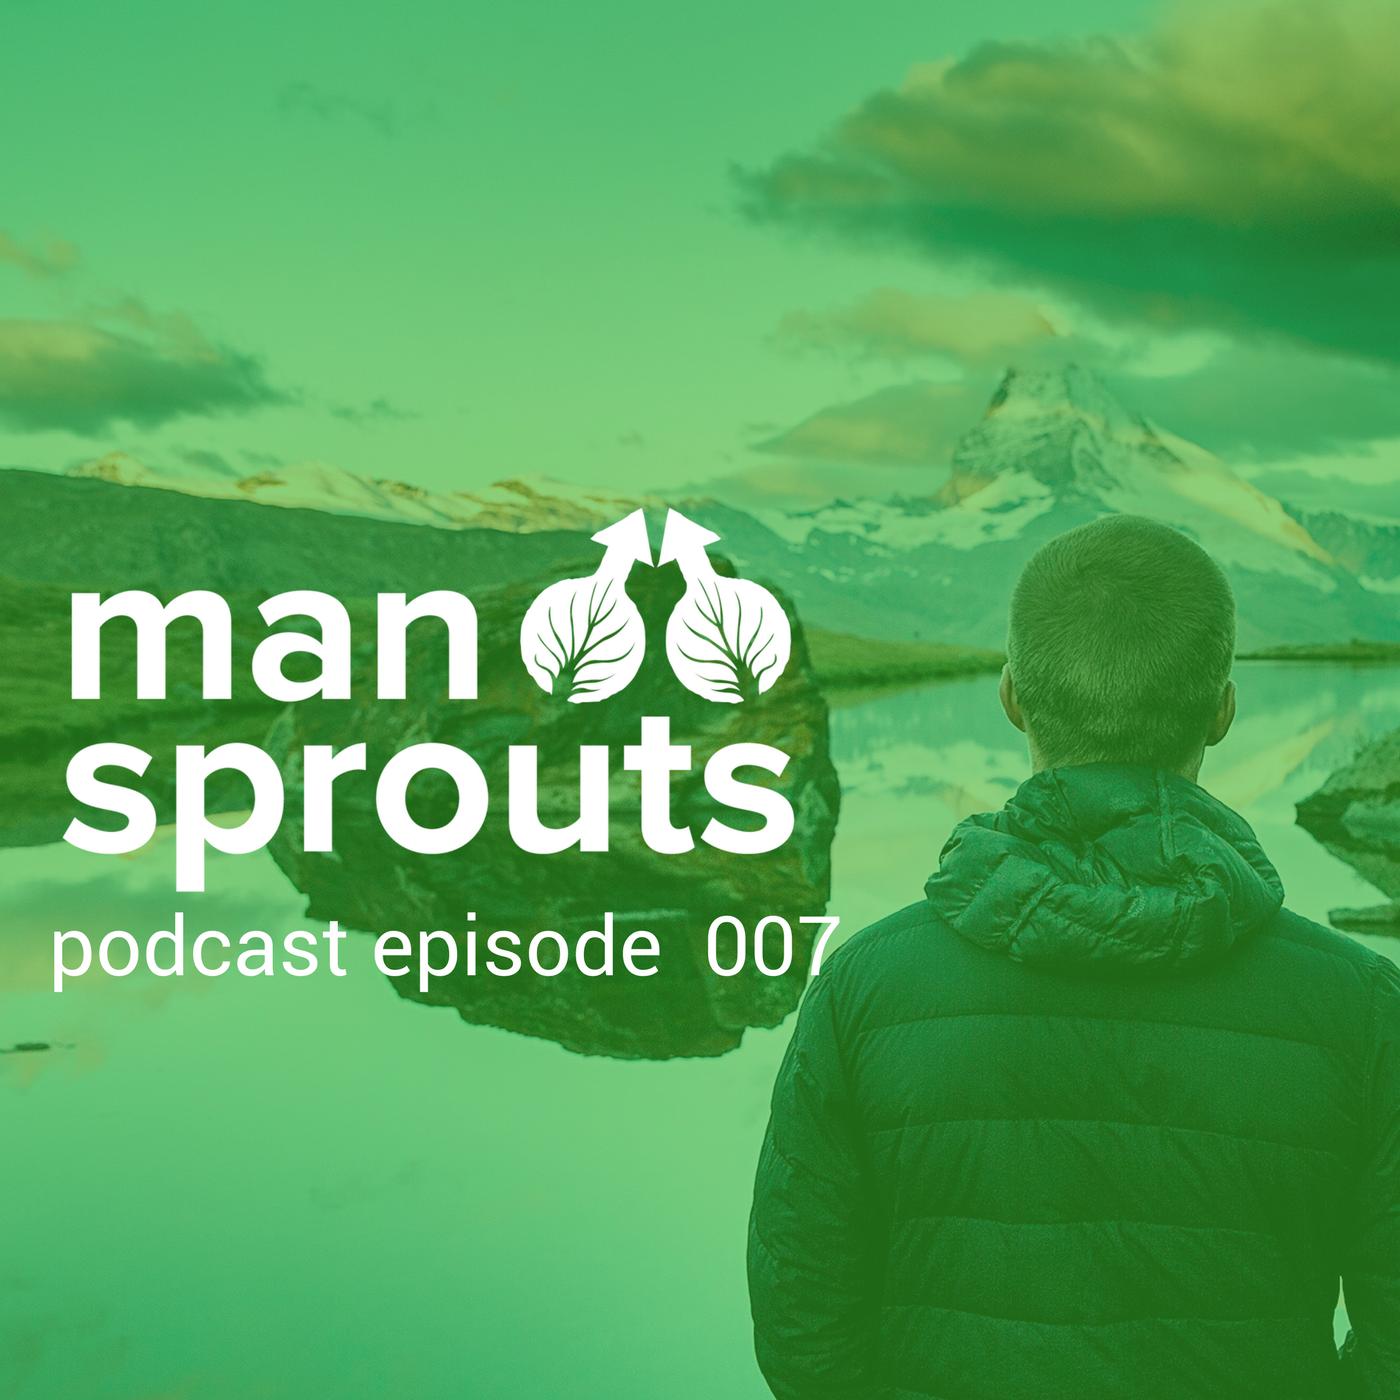 man sprouts podcast episode 7 - self esteem for men